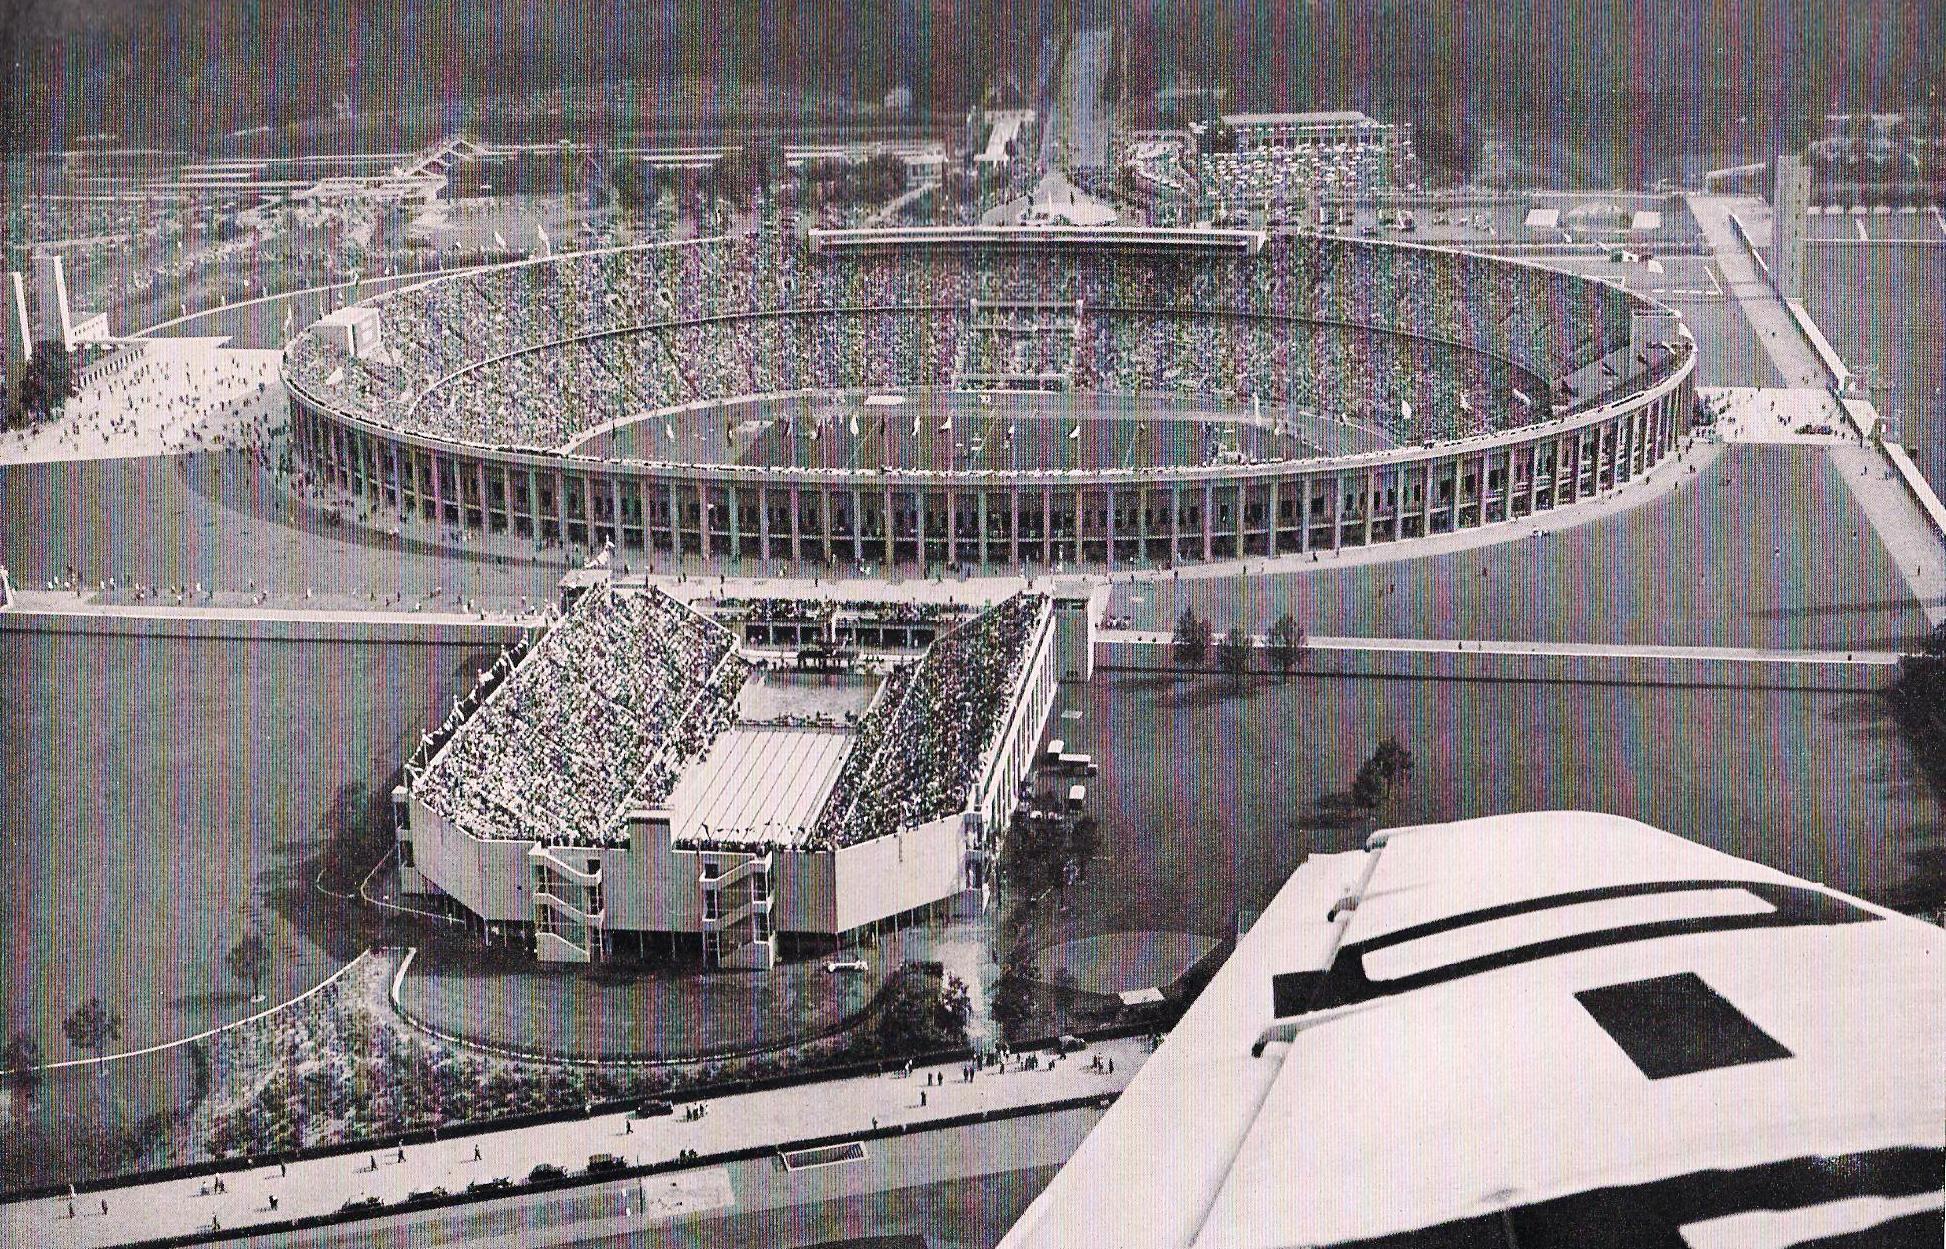 olympics complex berlin 1936